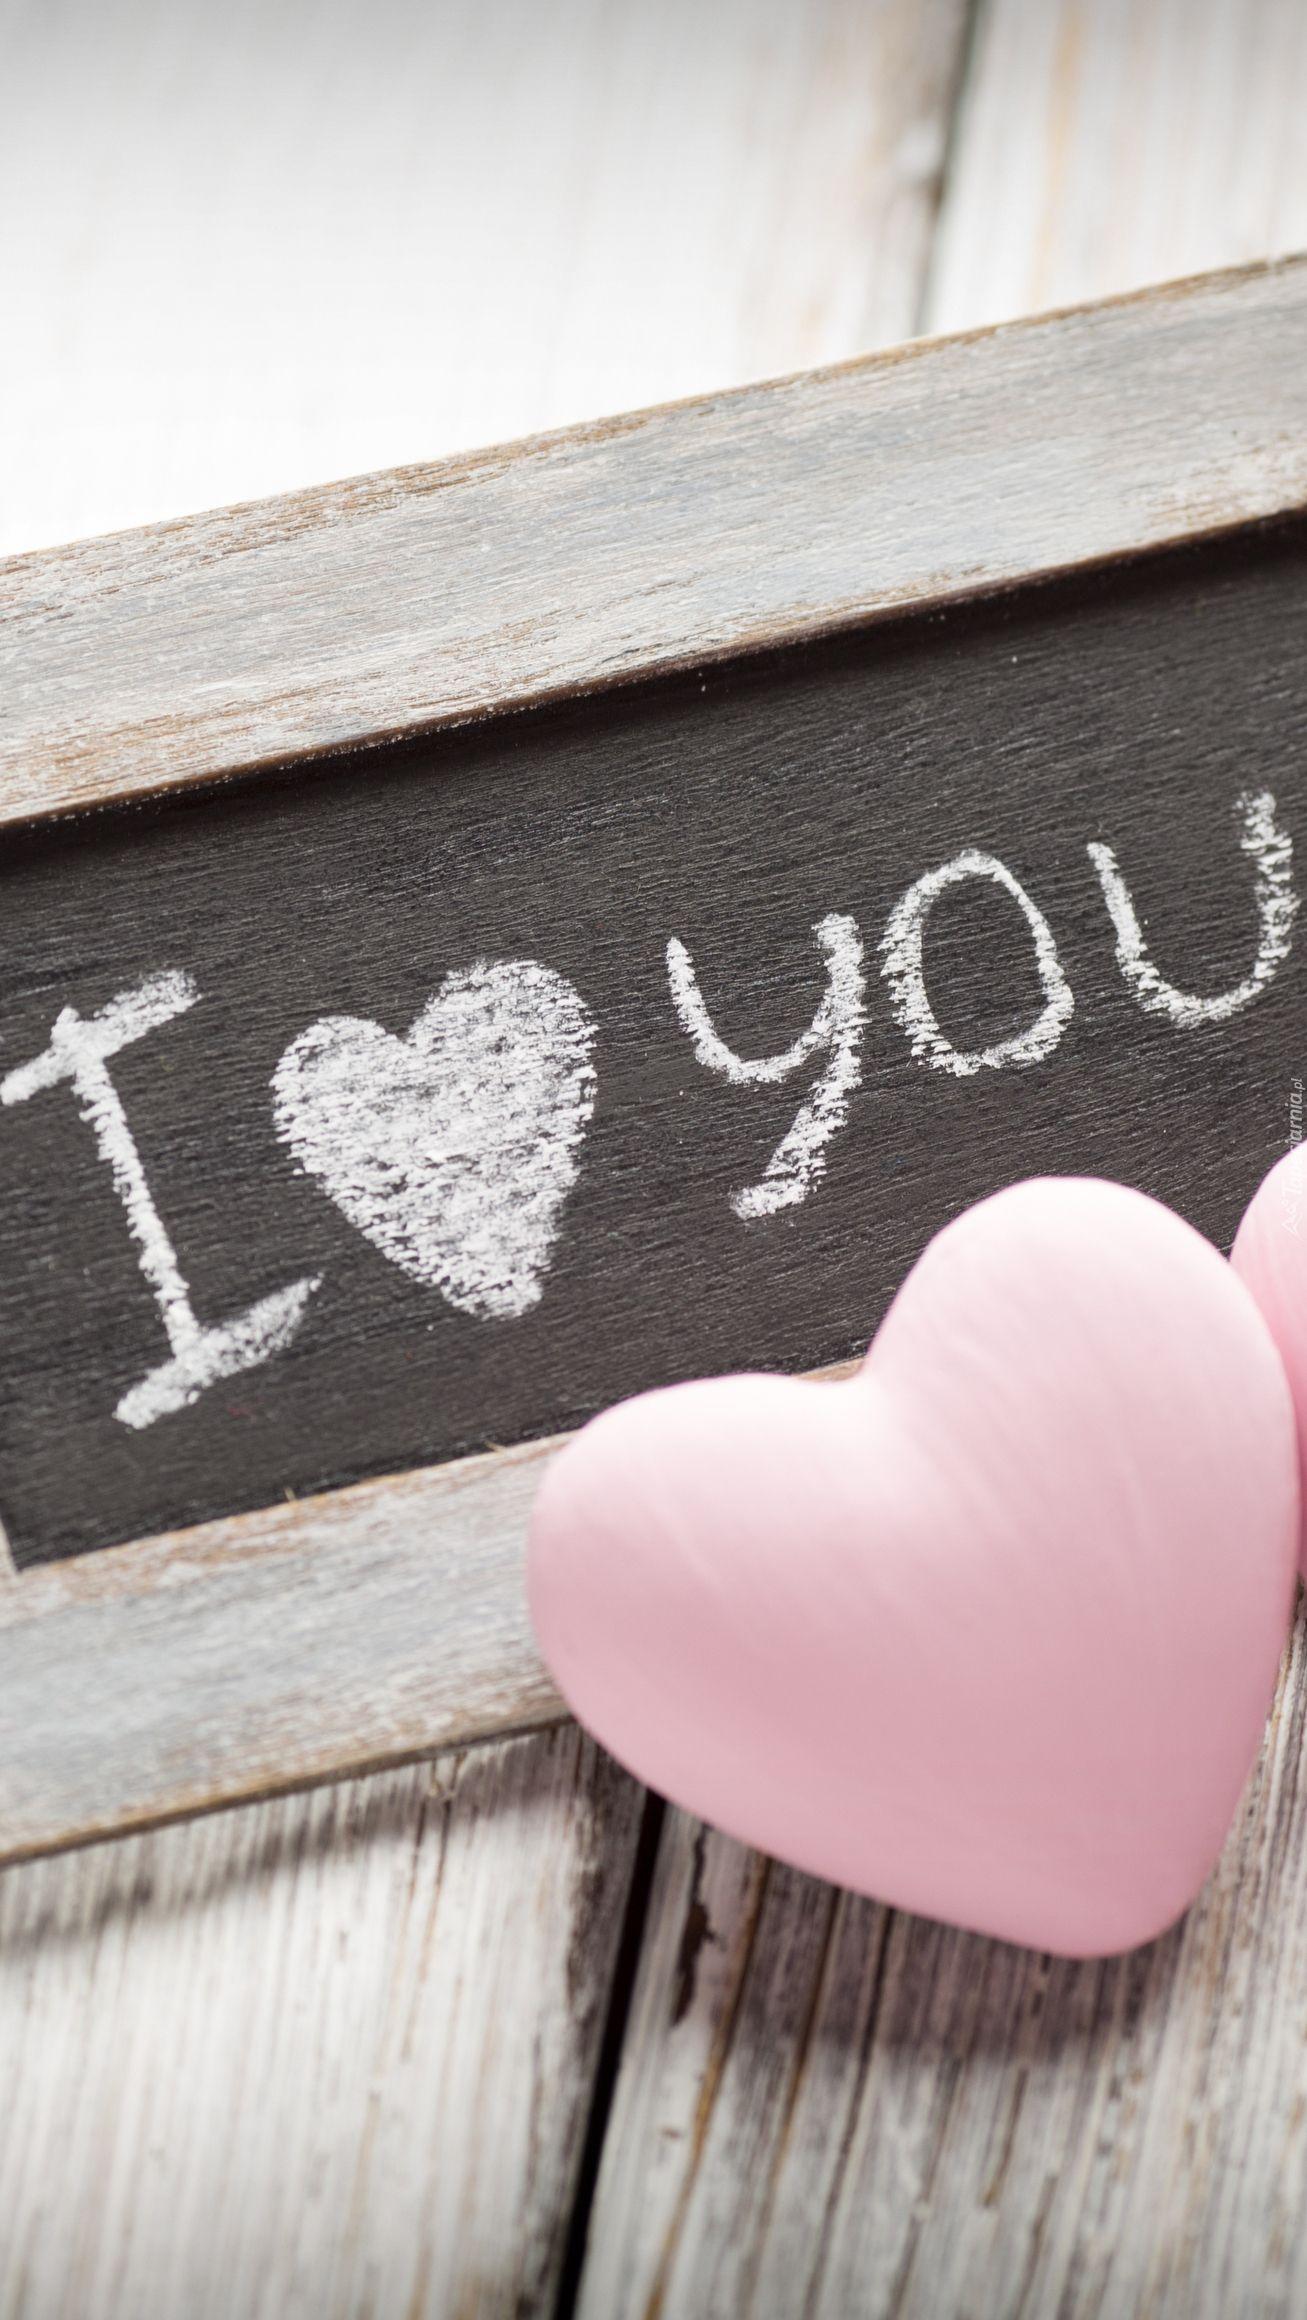 Tapeta Na Telefon Tabliczka Z Miłosnym Napisem Dodana Do Kategorii Miłosne Oraz Do Podkategorii Inne Dodan Love Wallpaper Heart Wallpaper Iphone Wallpaper Sky